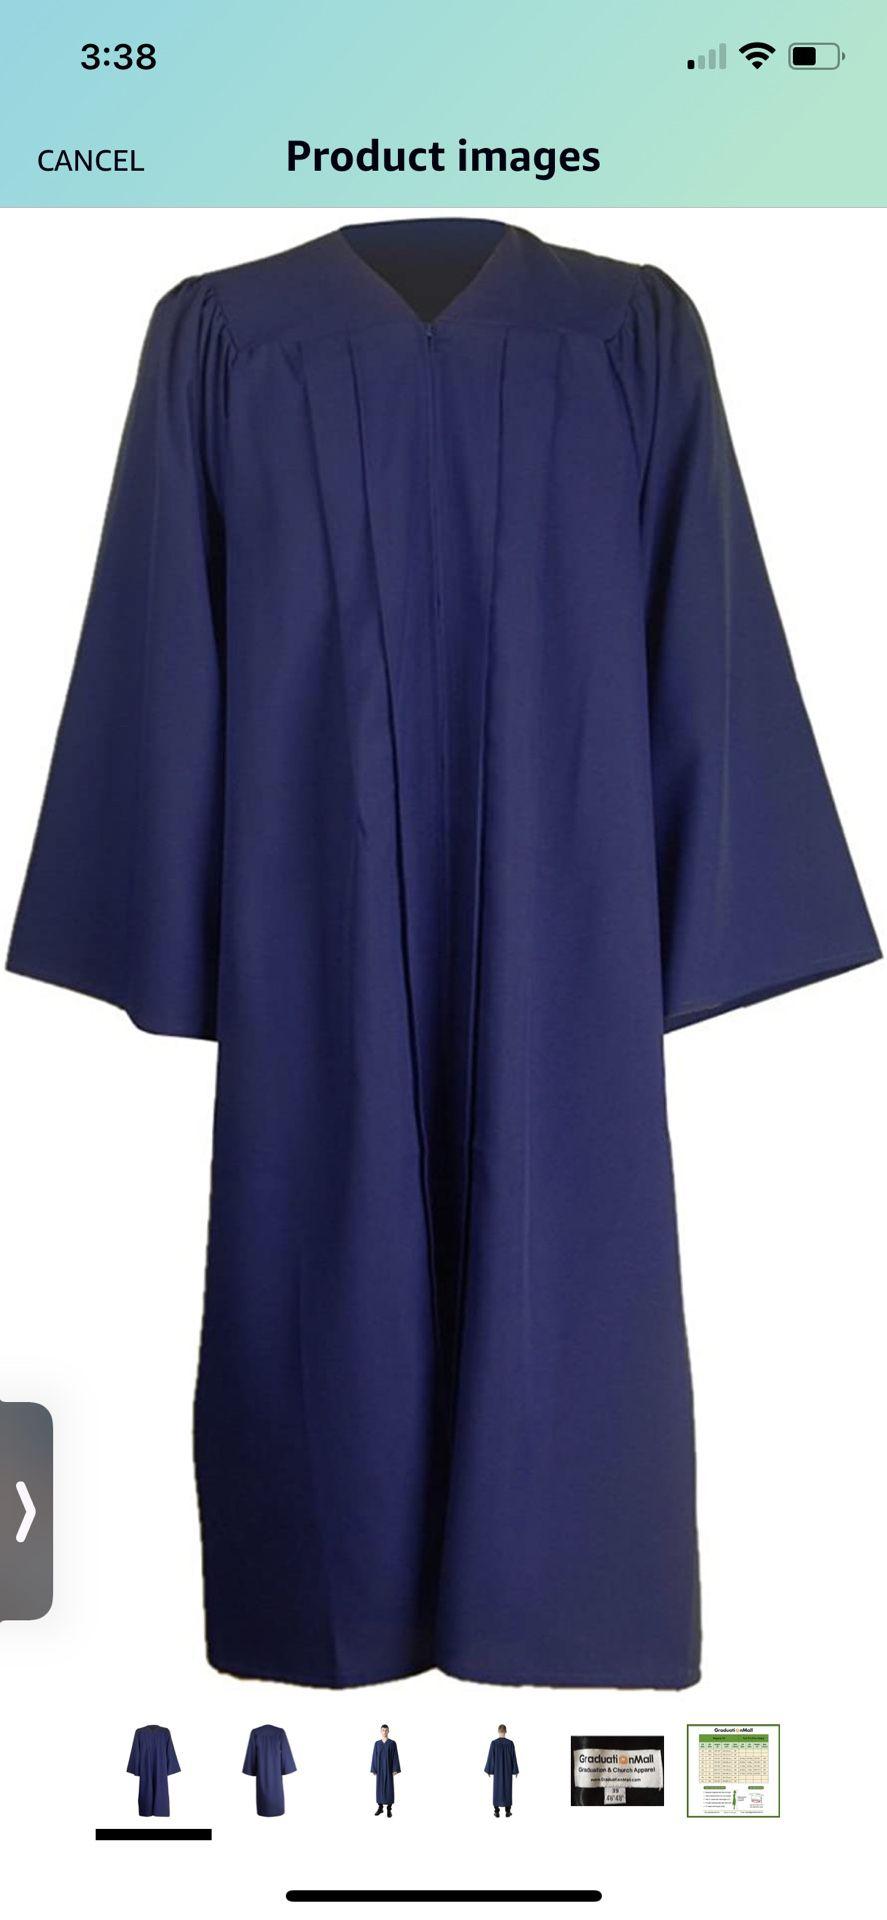 GraduationMall Unisex Matte Graduation Gown for High School & Bachelor